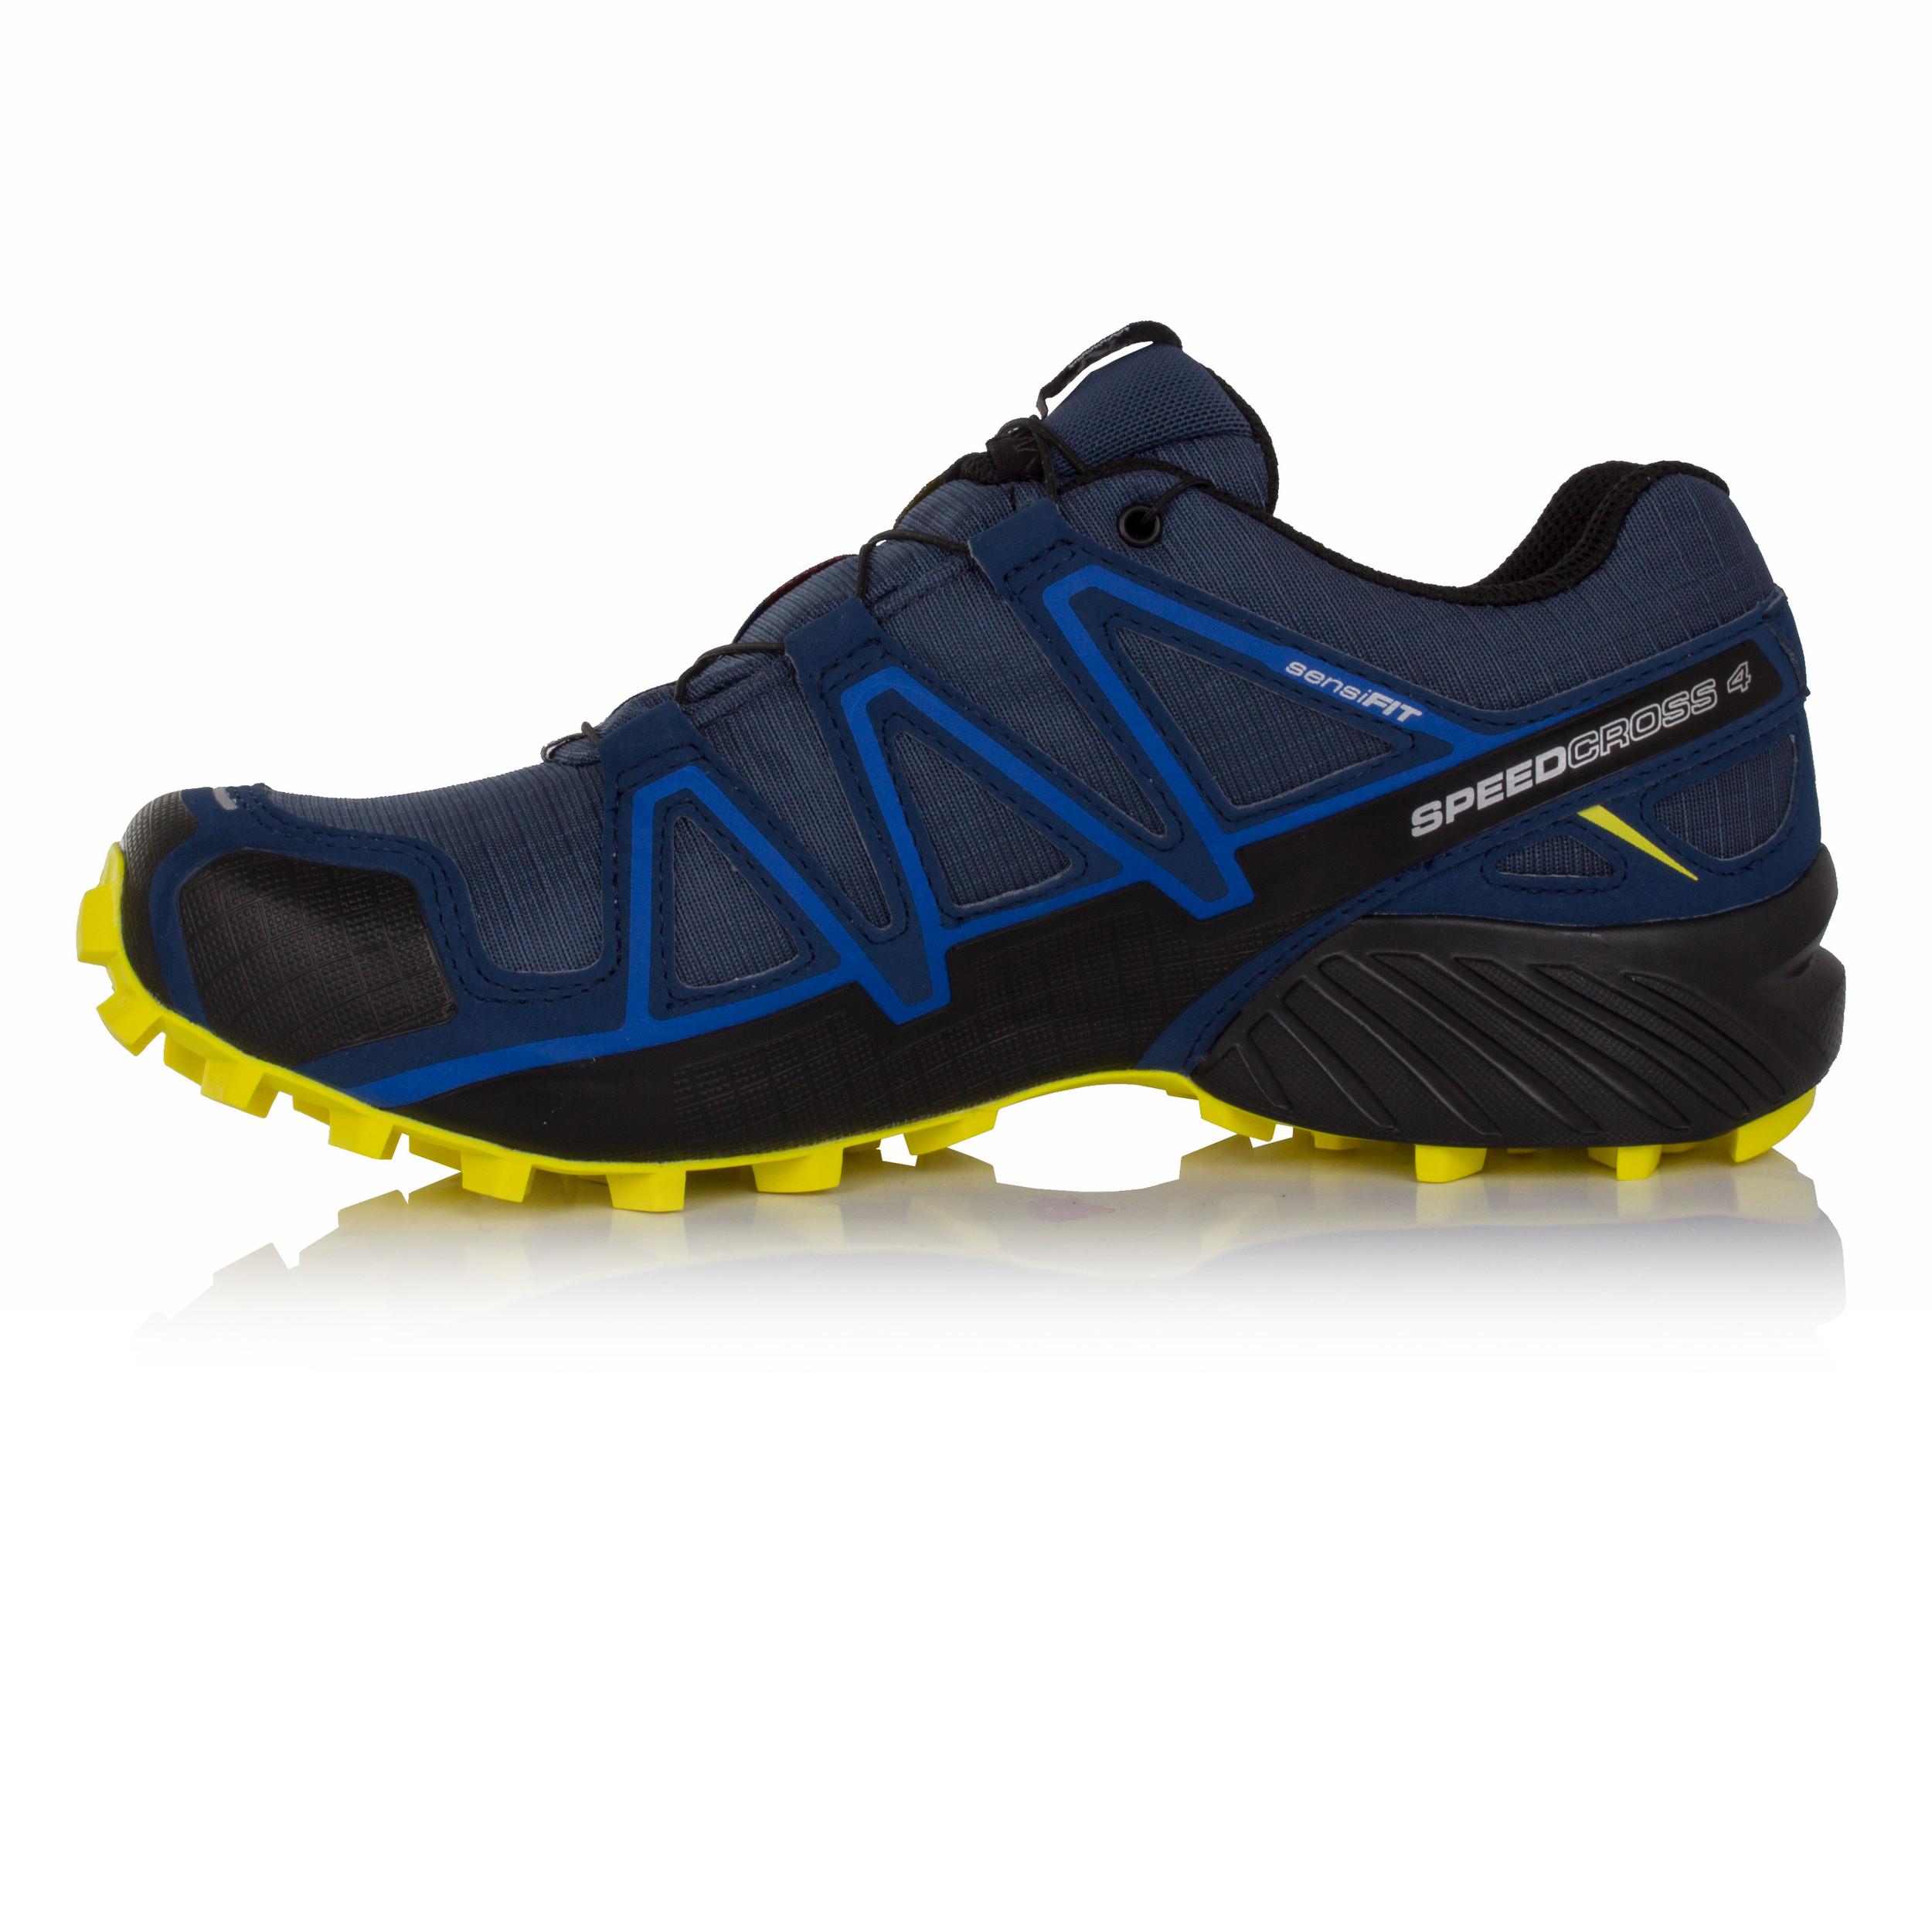 Salomon Speedcross 4 Mens Blue Gore Tex Waterproof Trail Running Shoes